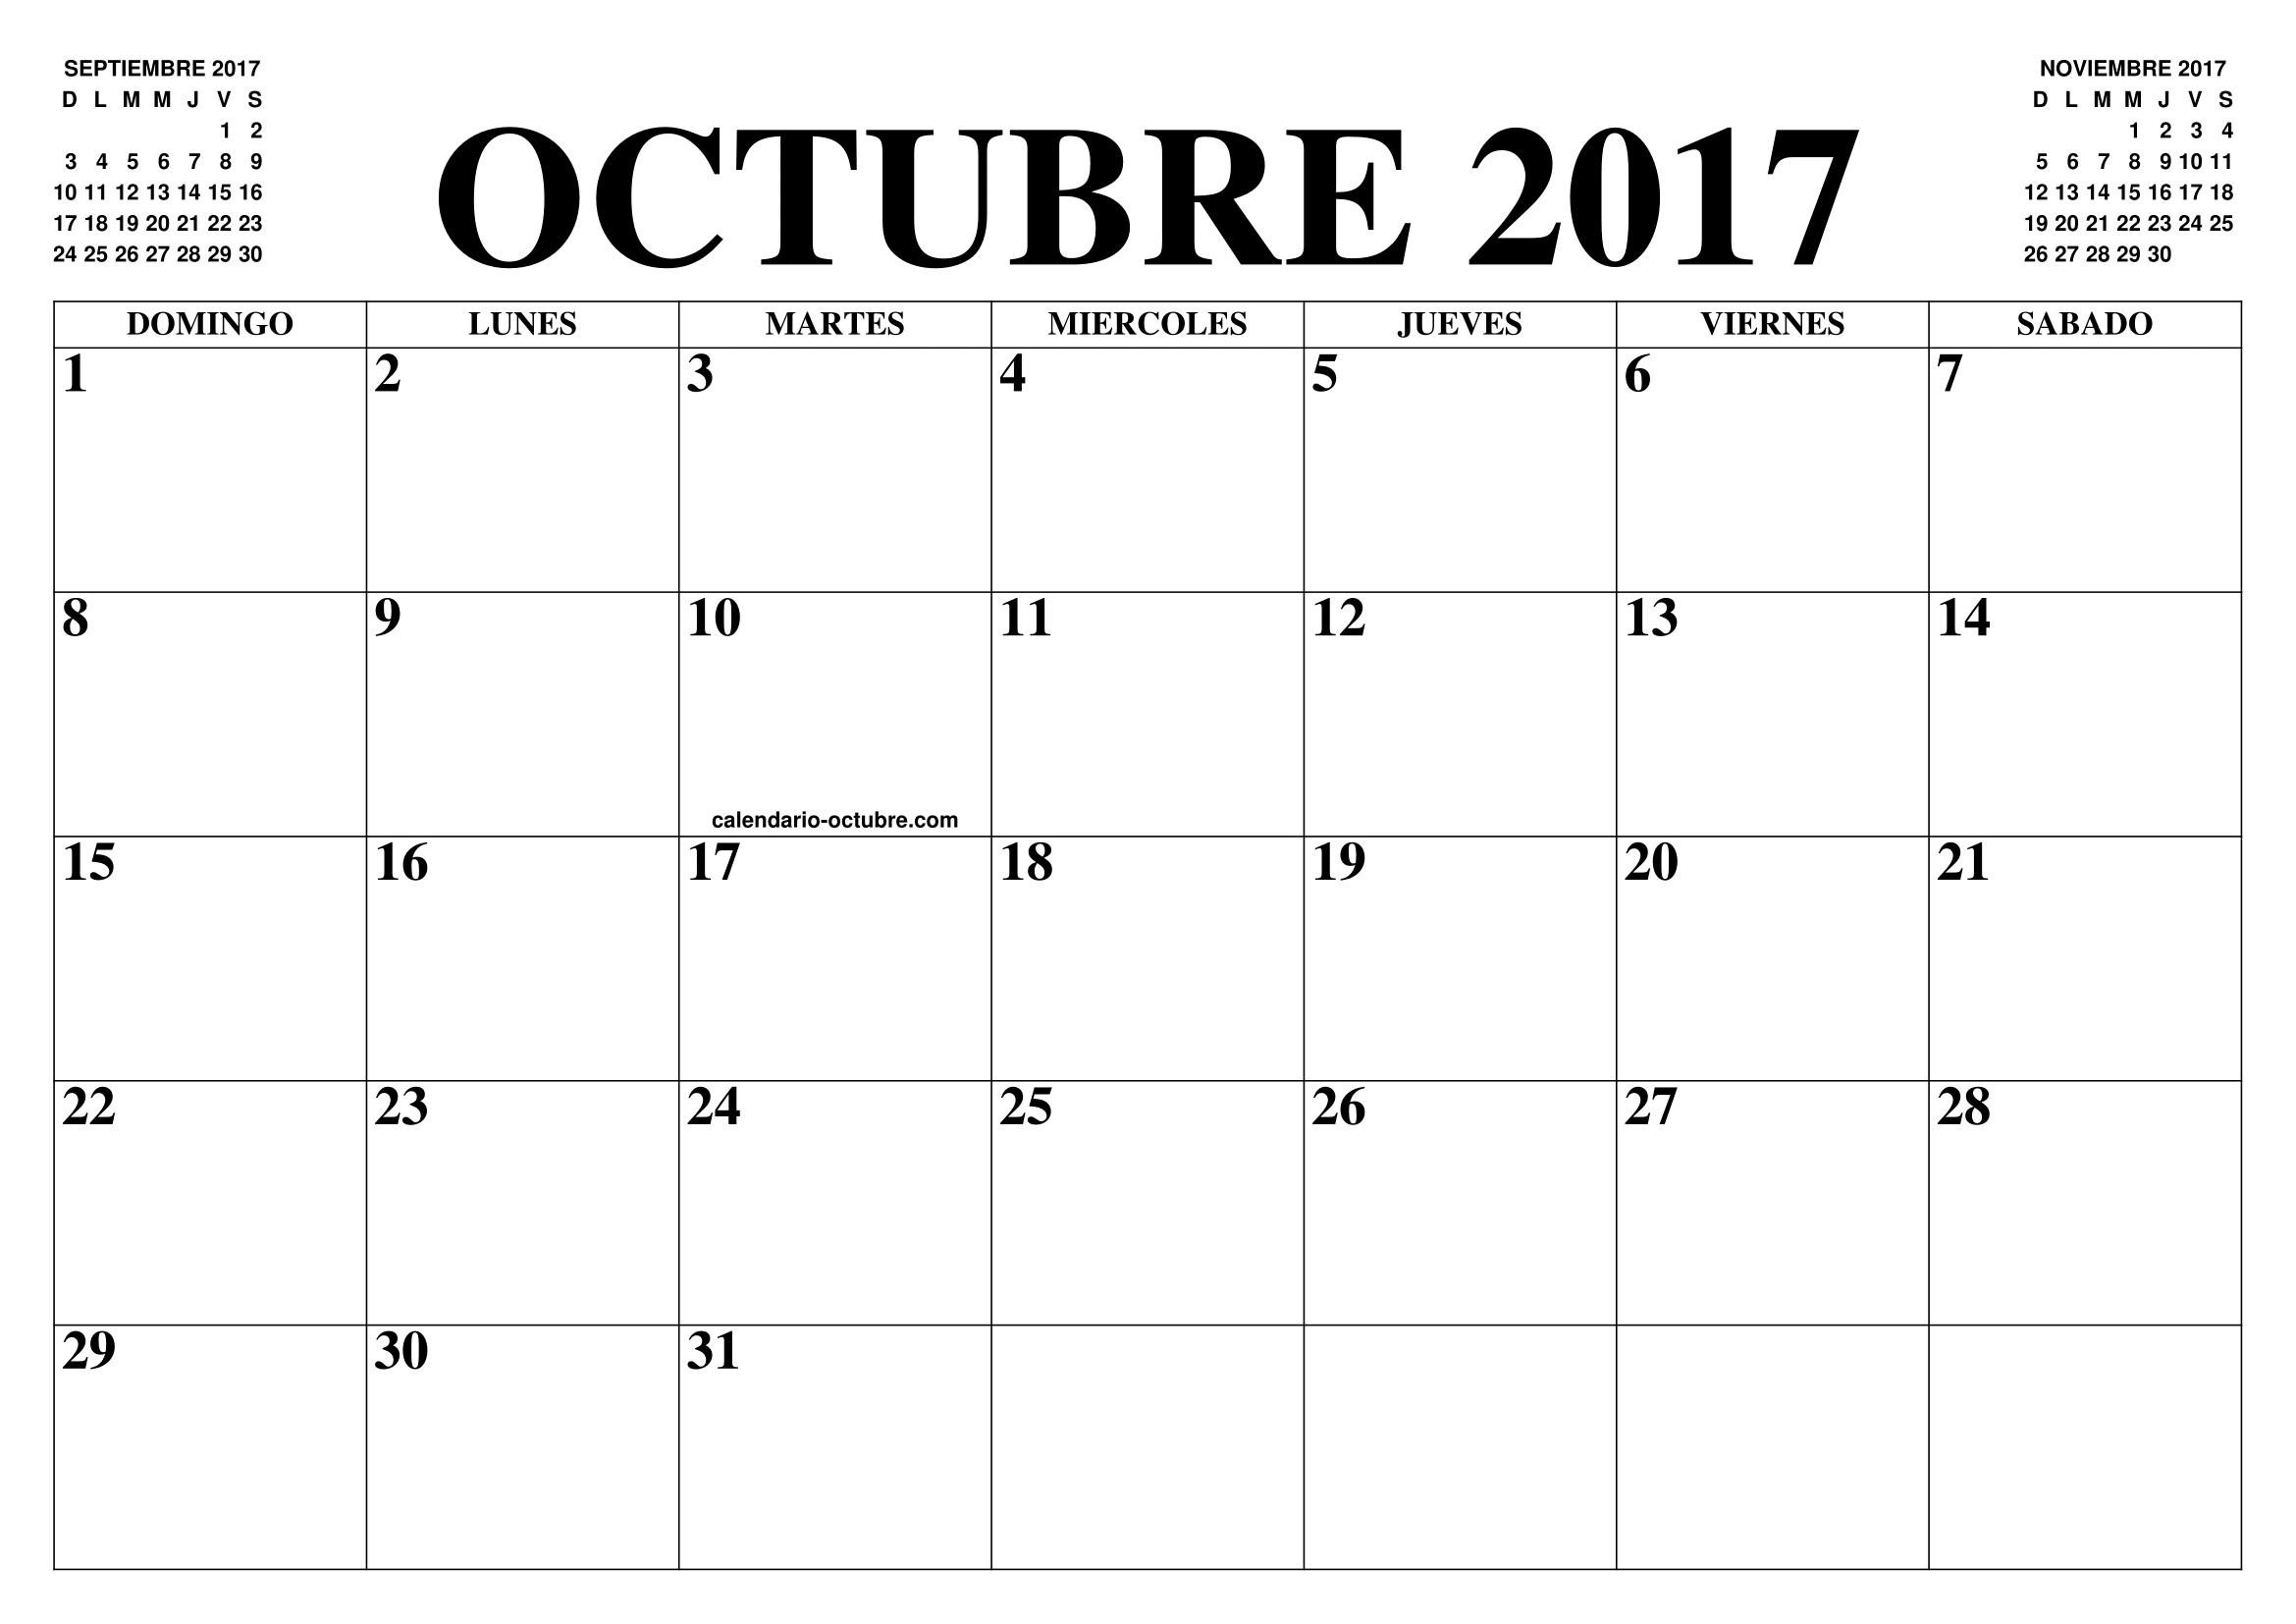 Calendario Mes De Septiembre 2019 Para Imprimir Más Populares Best Calendario Septiembre Y Octubre 2015 Para Imprimir Image Collection